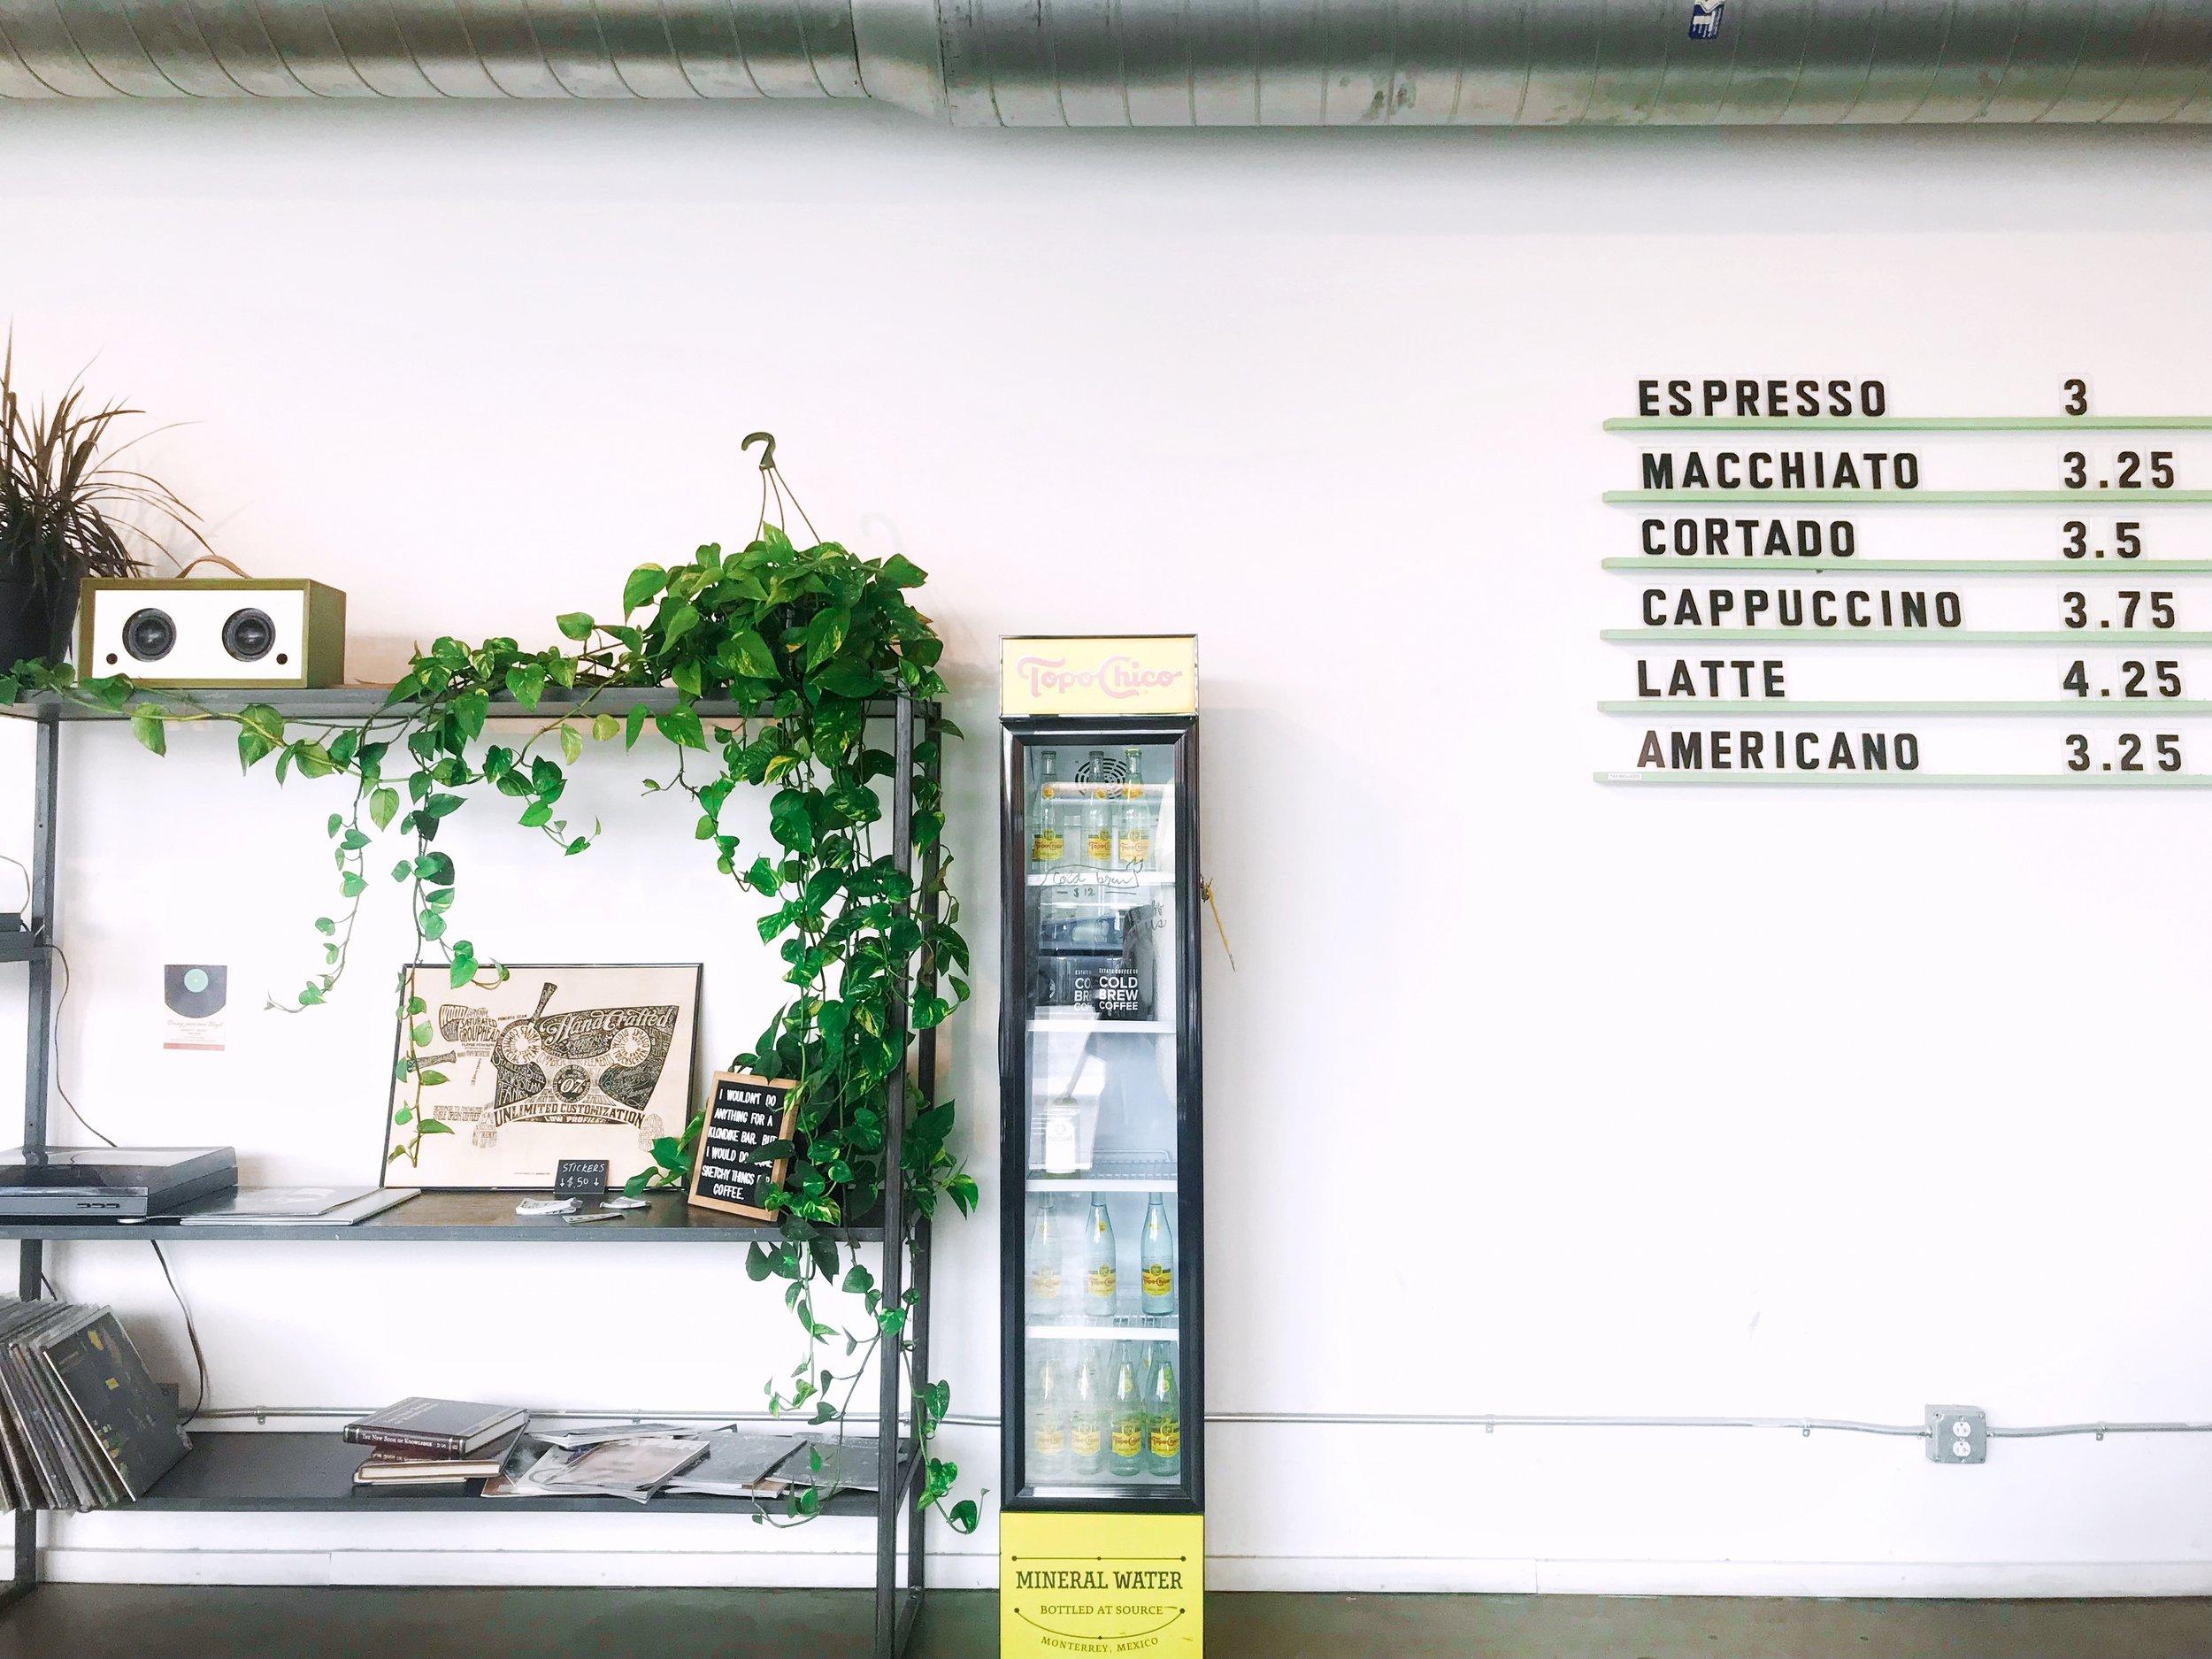 estatecoffee.jpg